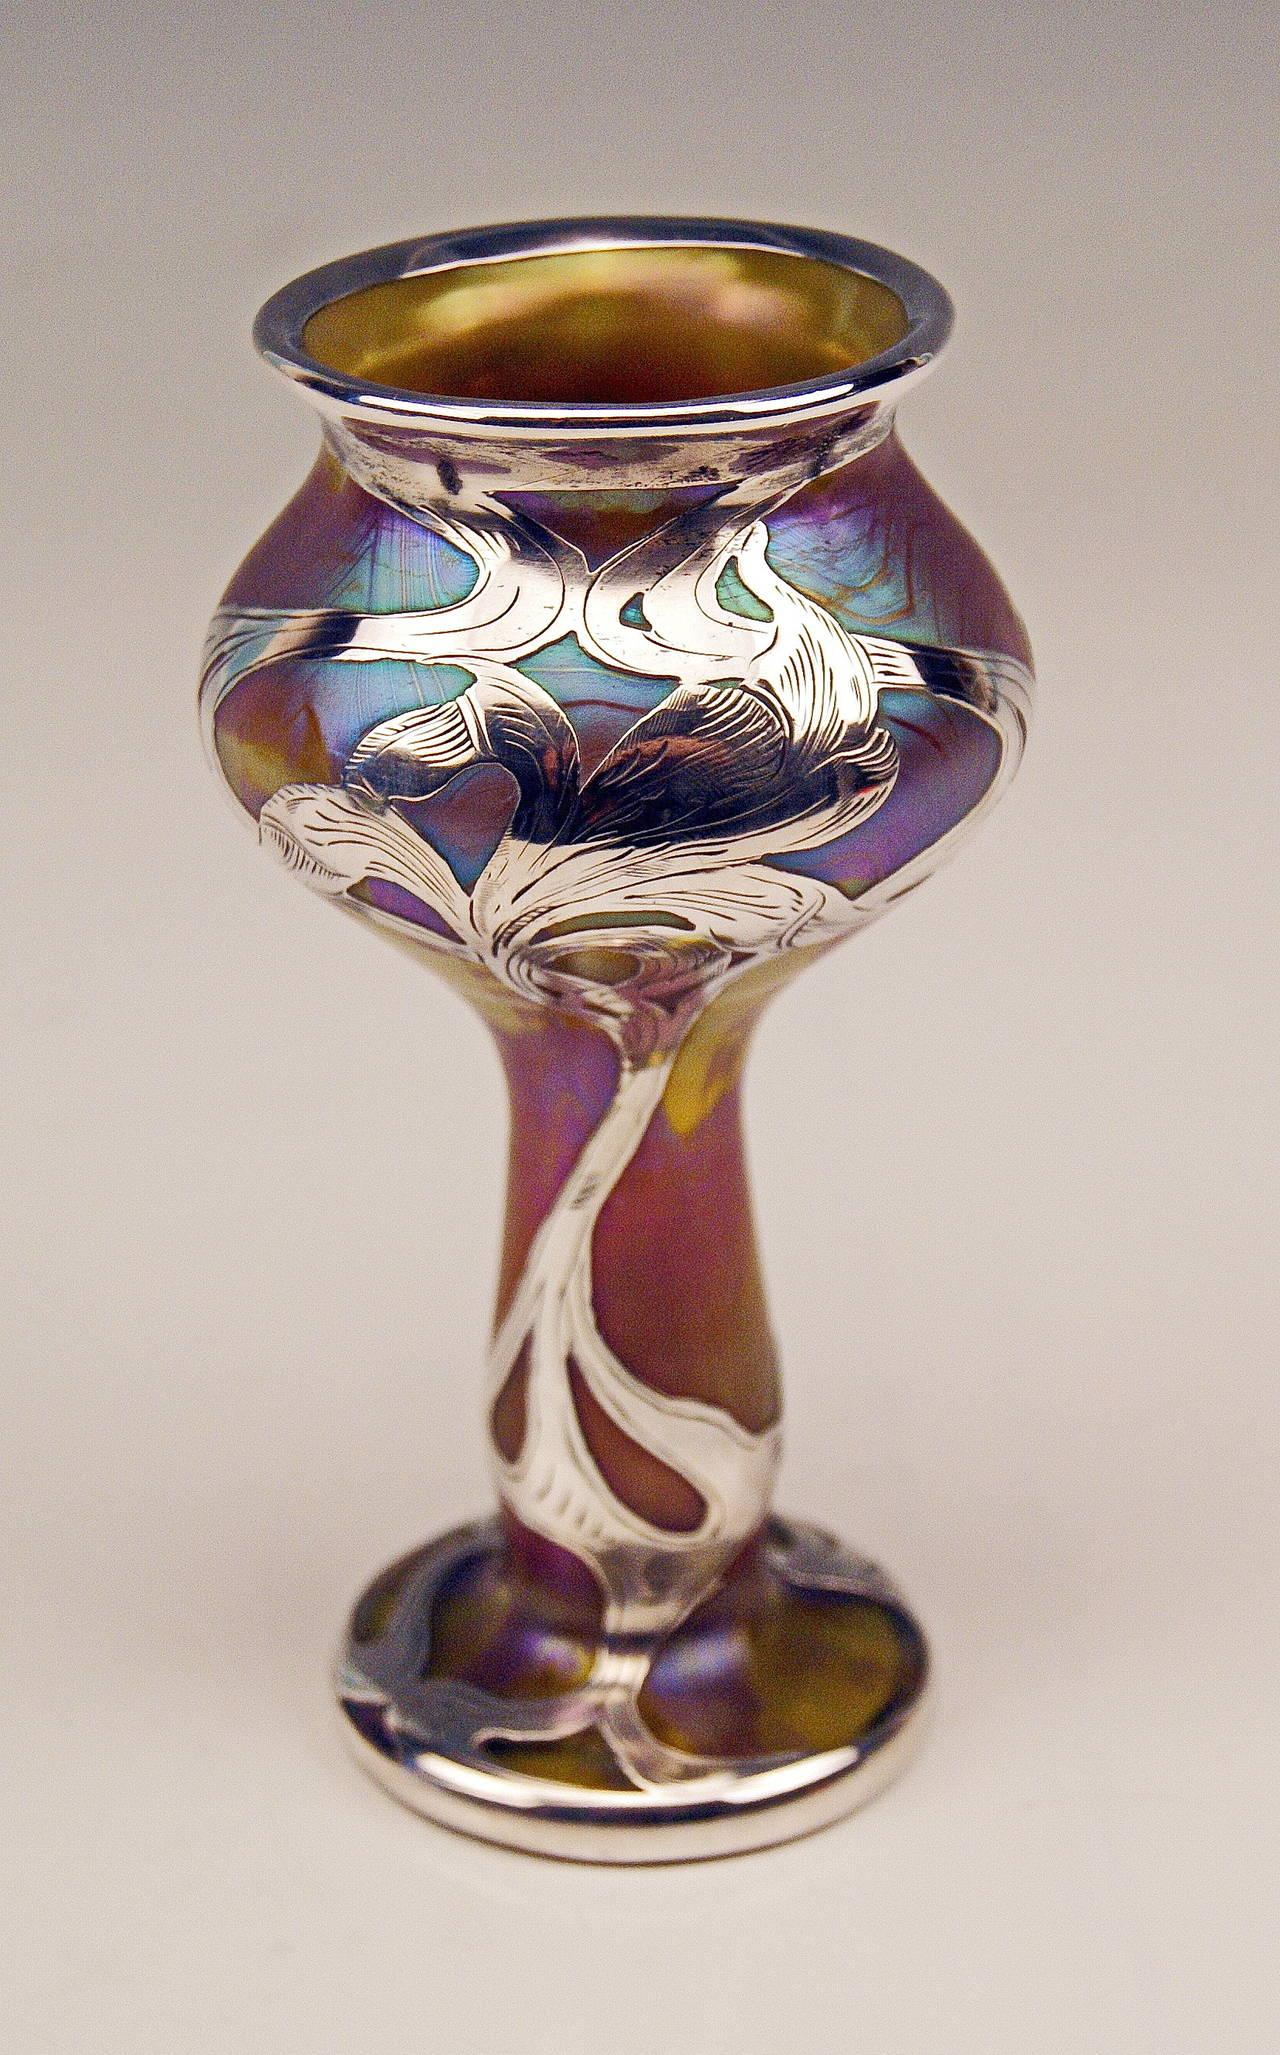 Vase Loetz Widow Art Nouveau Phaenomen Gre Silver Overlay, circa 1900 For Sale 3